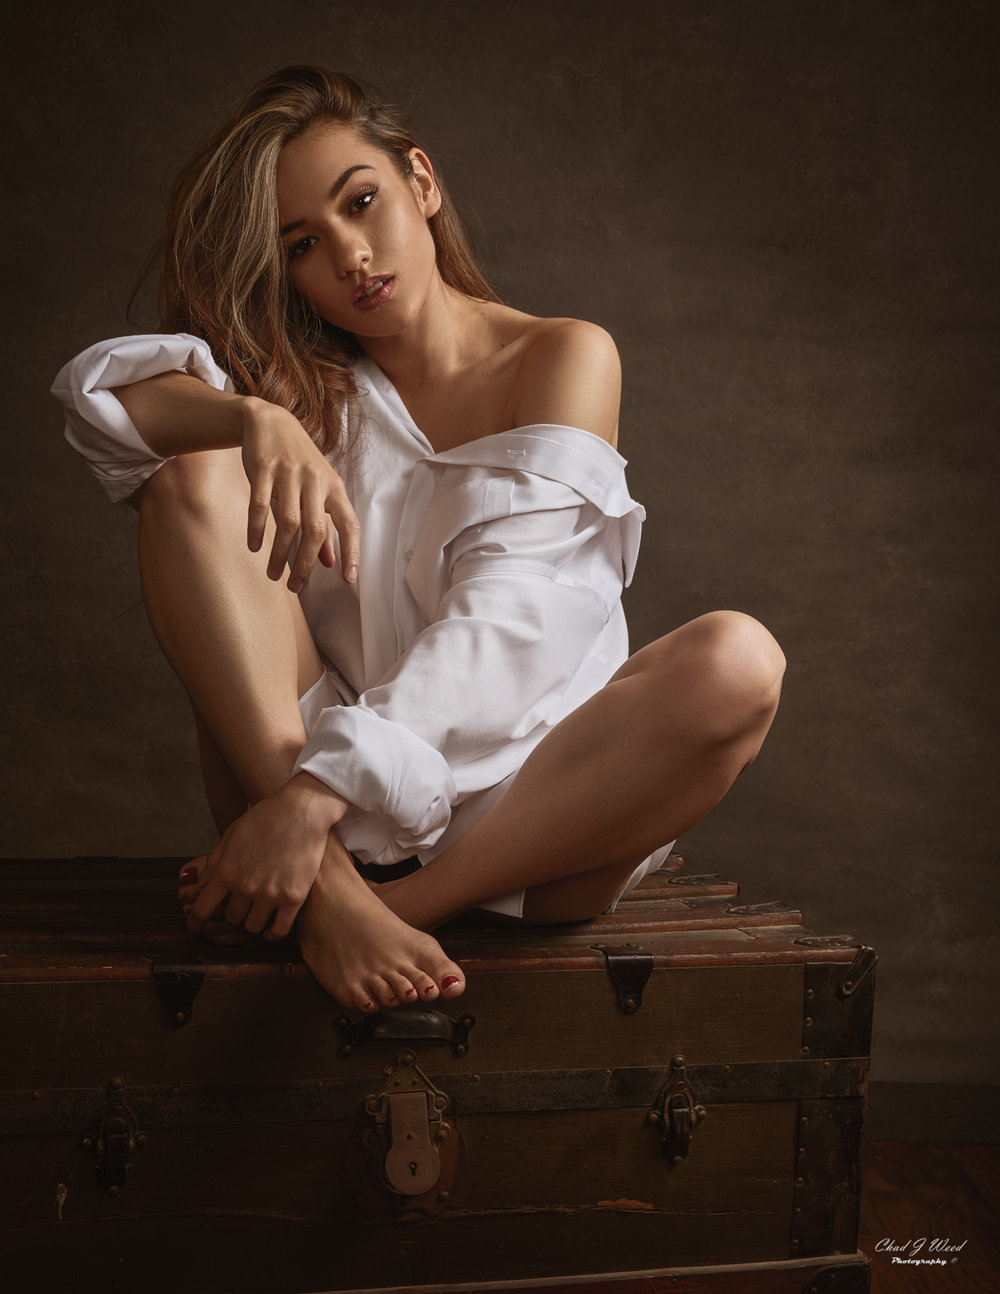 Fashion Model Candice by Arizona Fashion Photographer Chad Weed